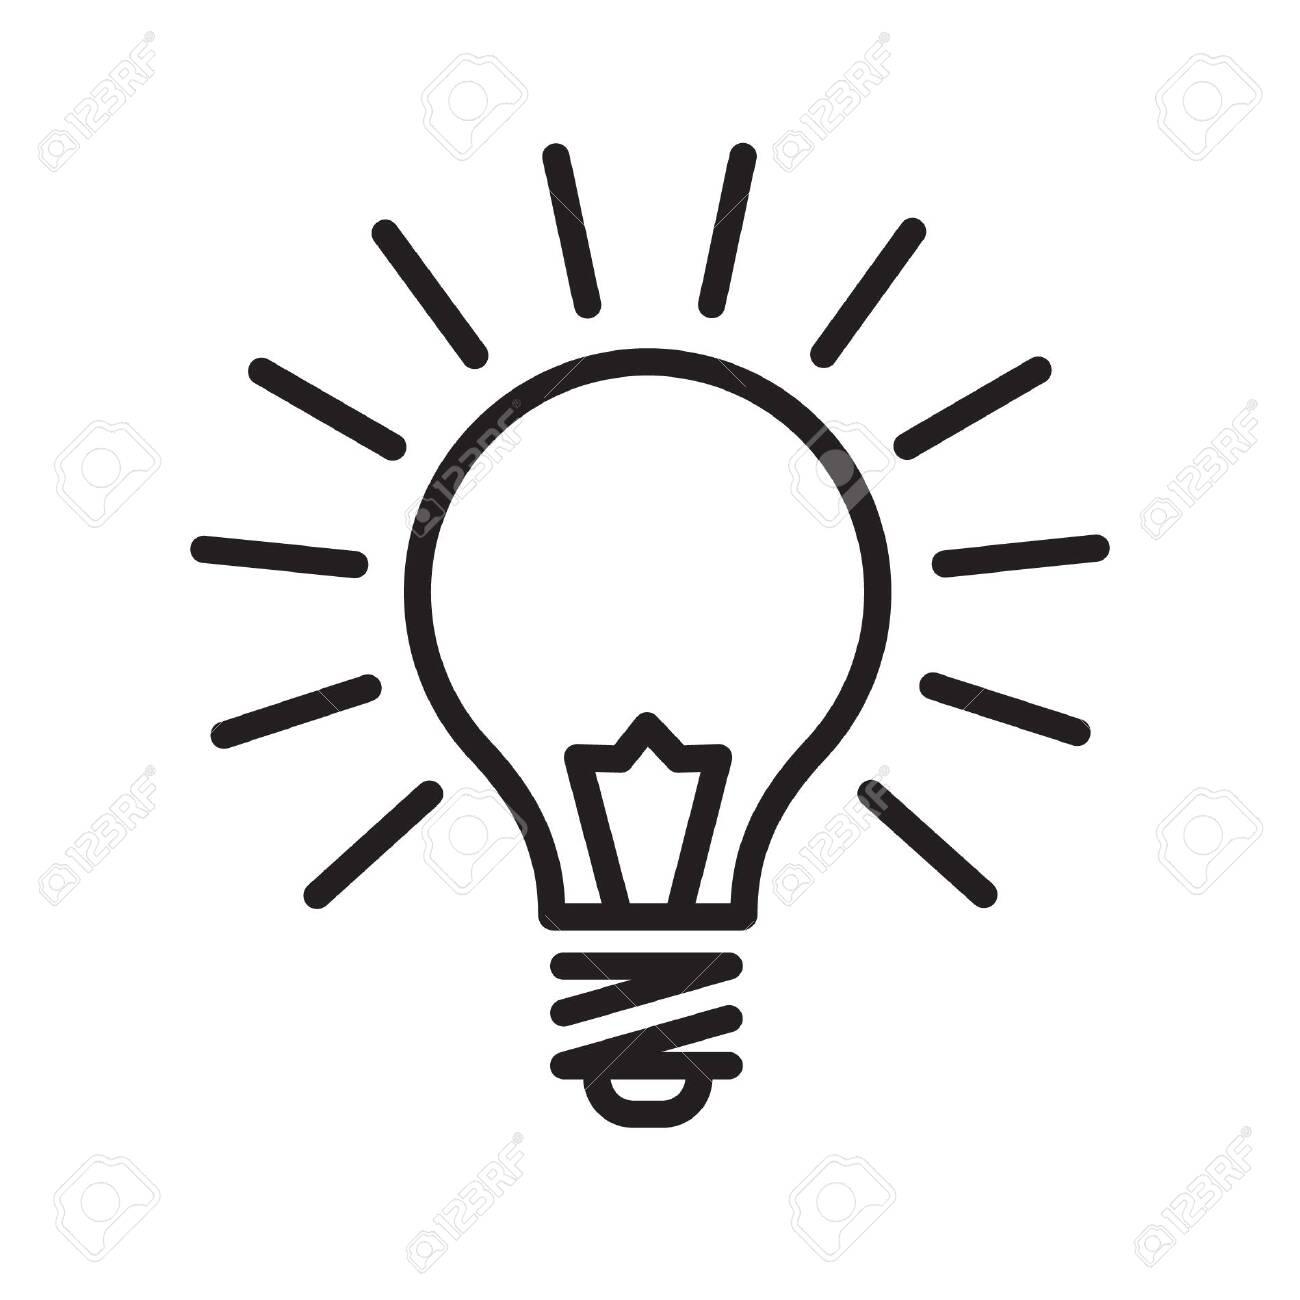 Light bulb icon - 126399734